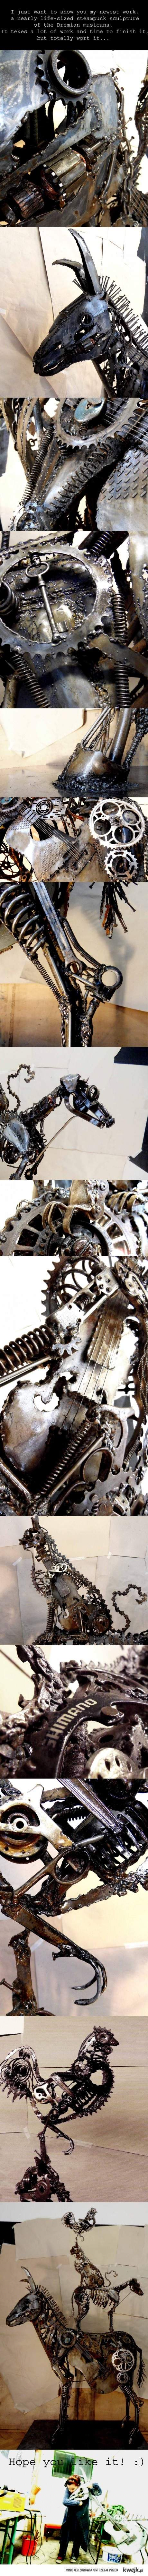 steampunkowe instrumenty